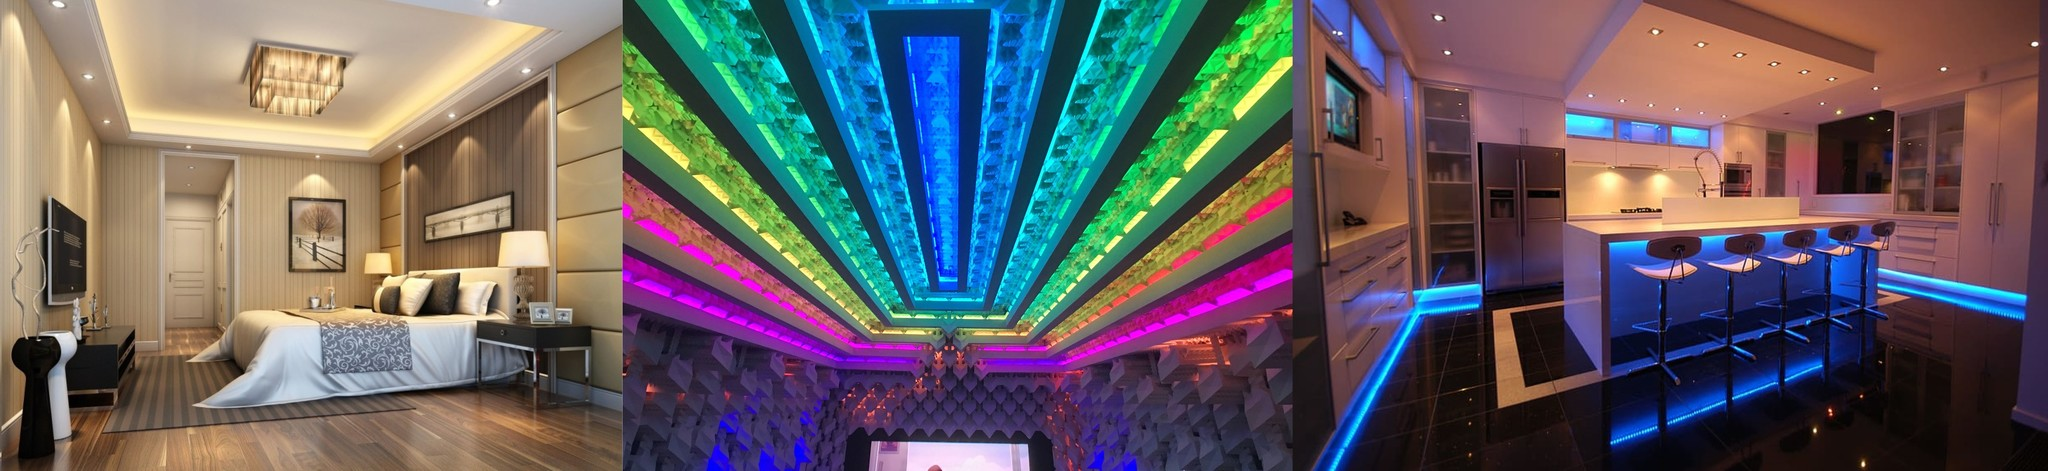 Li-Fi network: Internet Through LED Lights